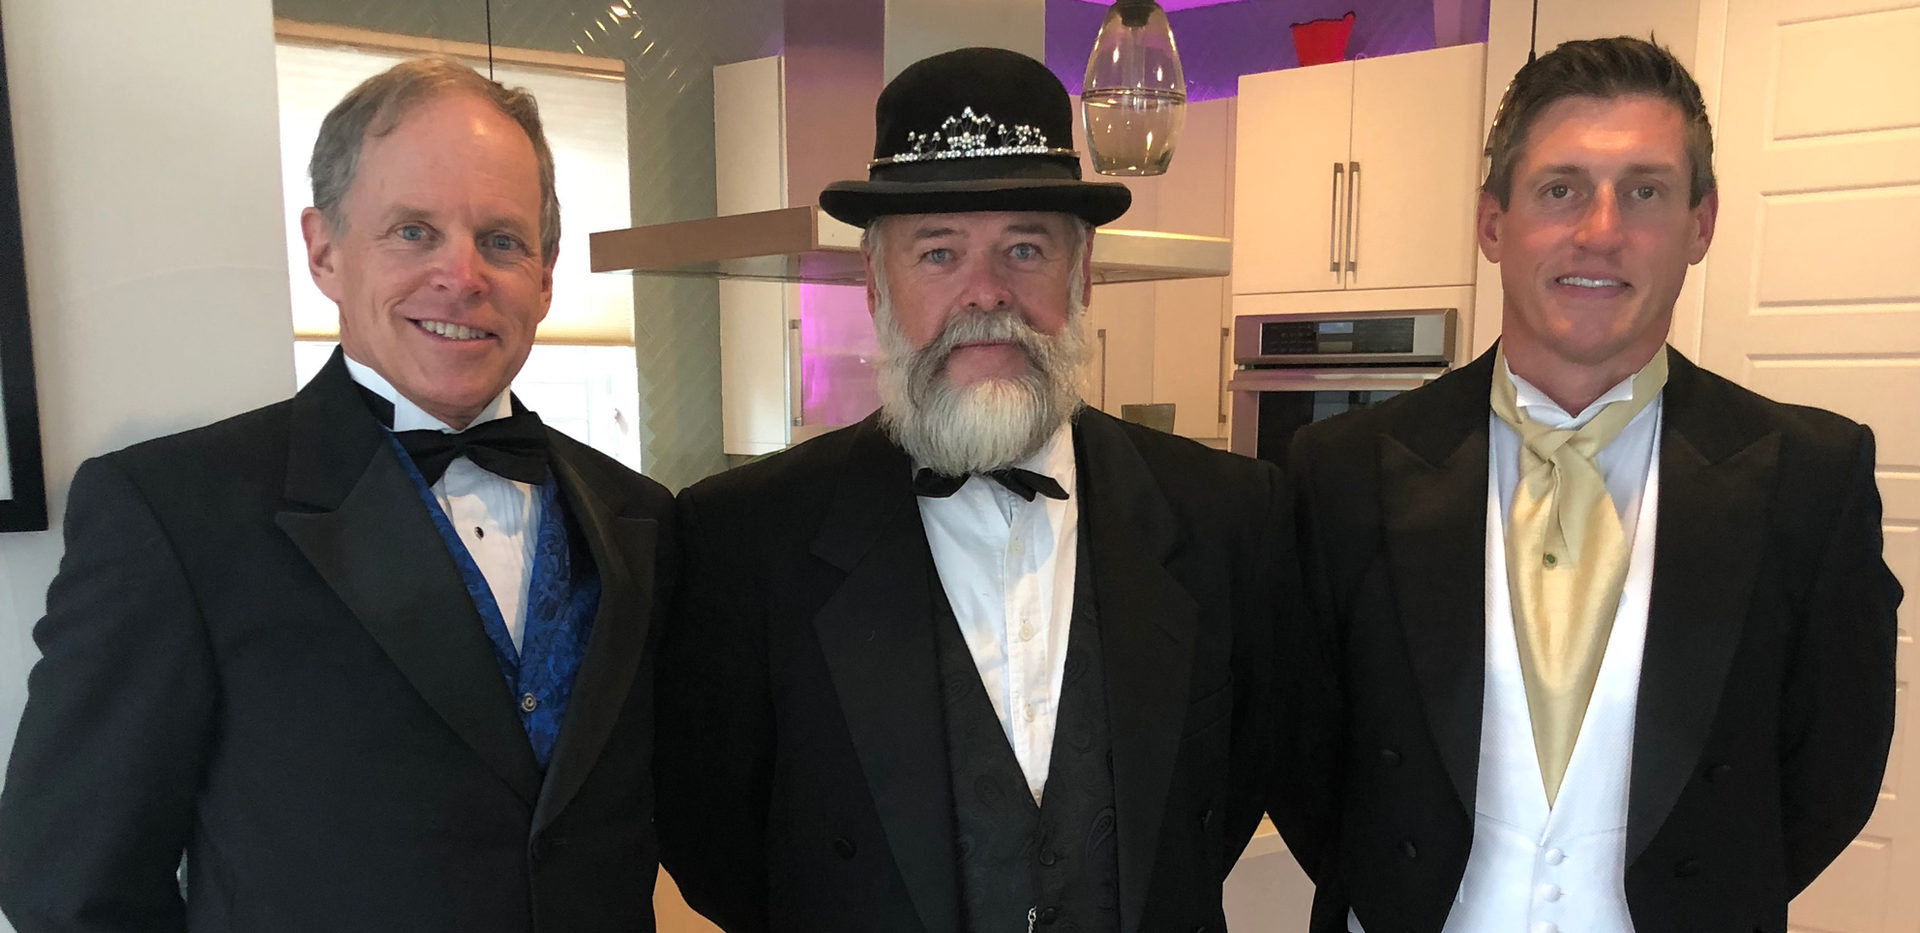 Royal Wedding Tea - 2018 - Duffy Boyle, Daniel Michael and John Gustafson